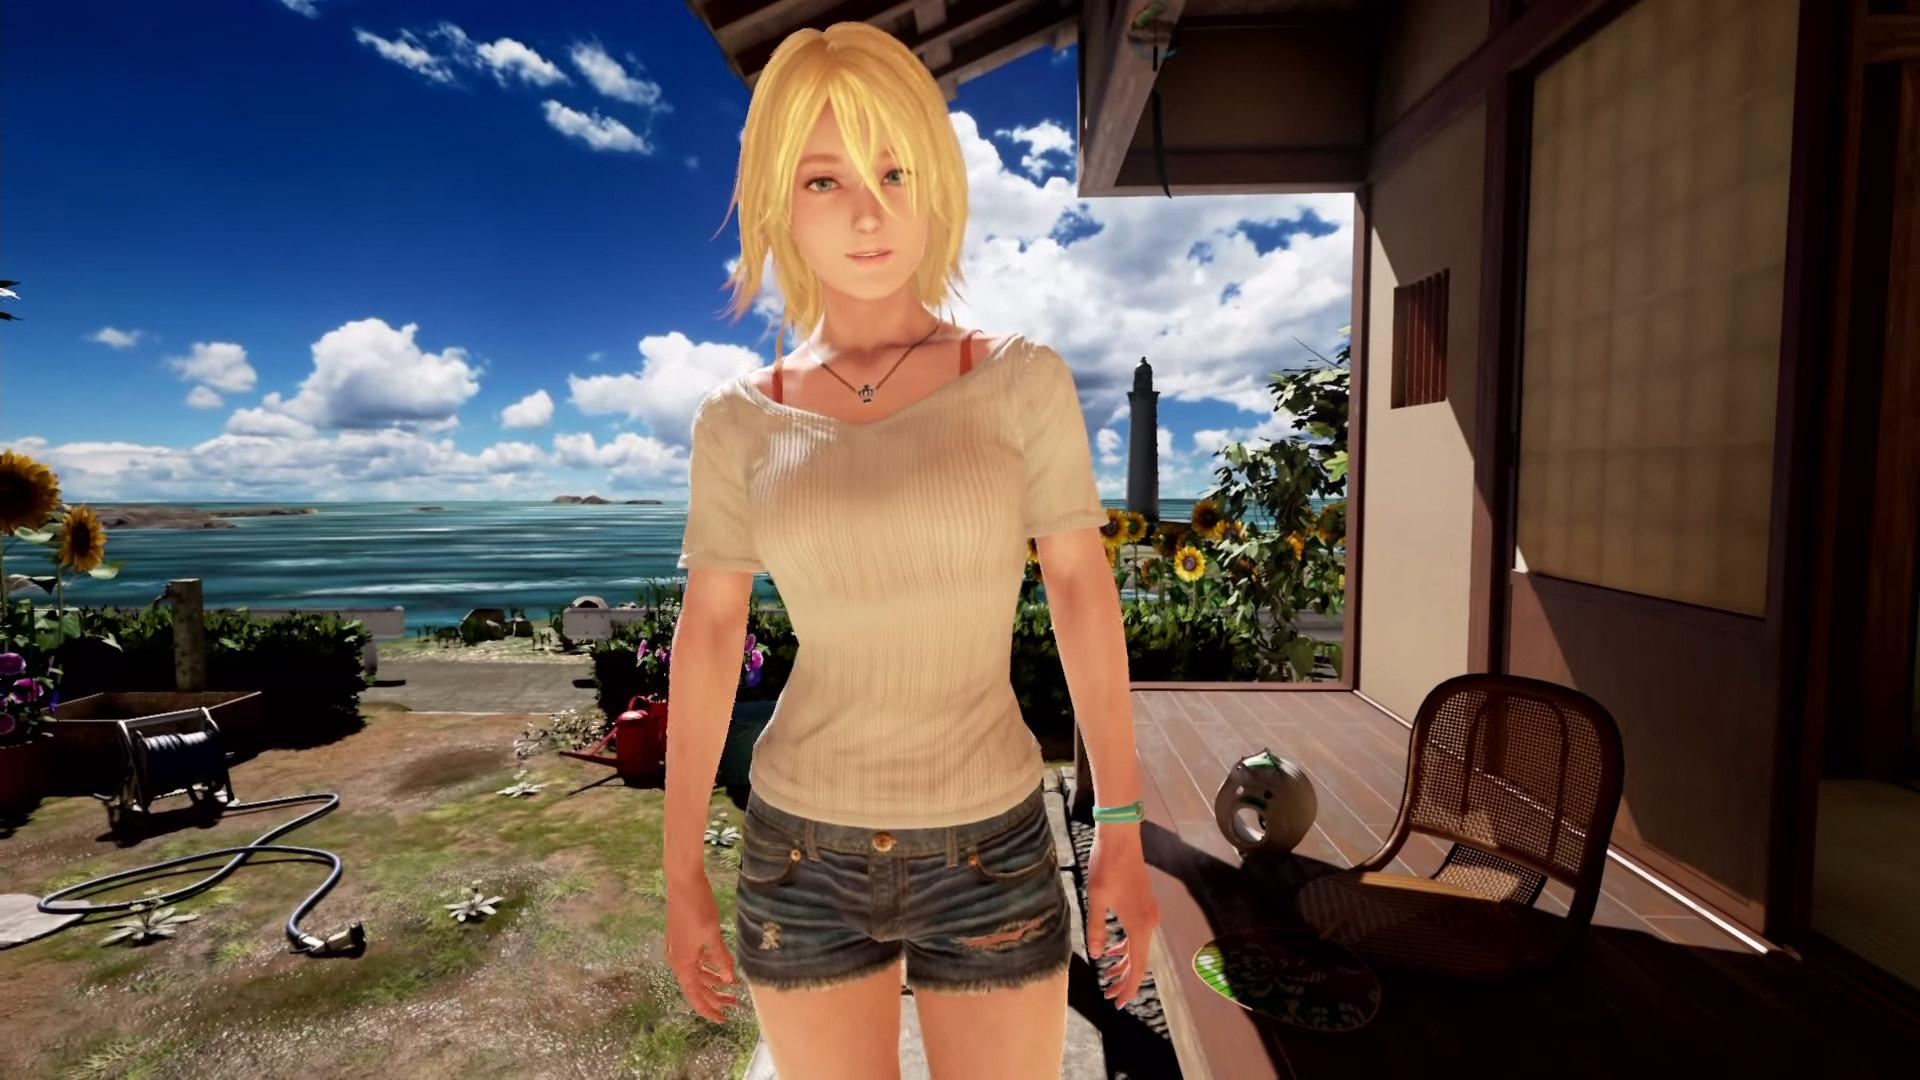 Summer Lesson Girlfriend Playstation Vr Blonde Bombshell -2023